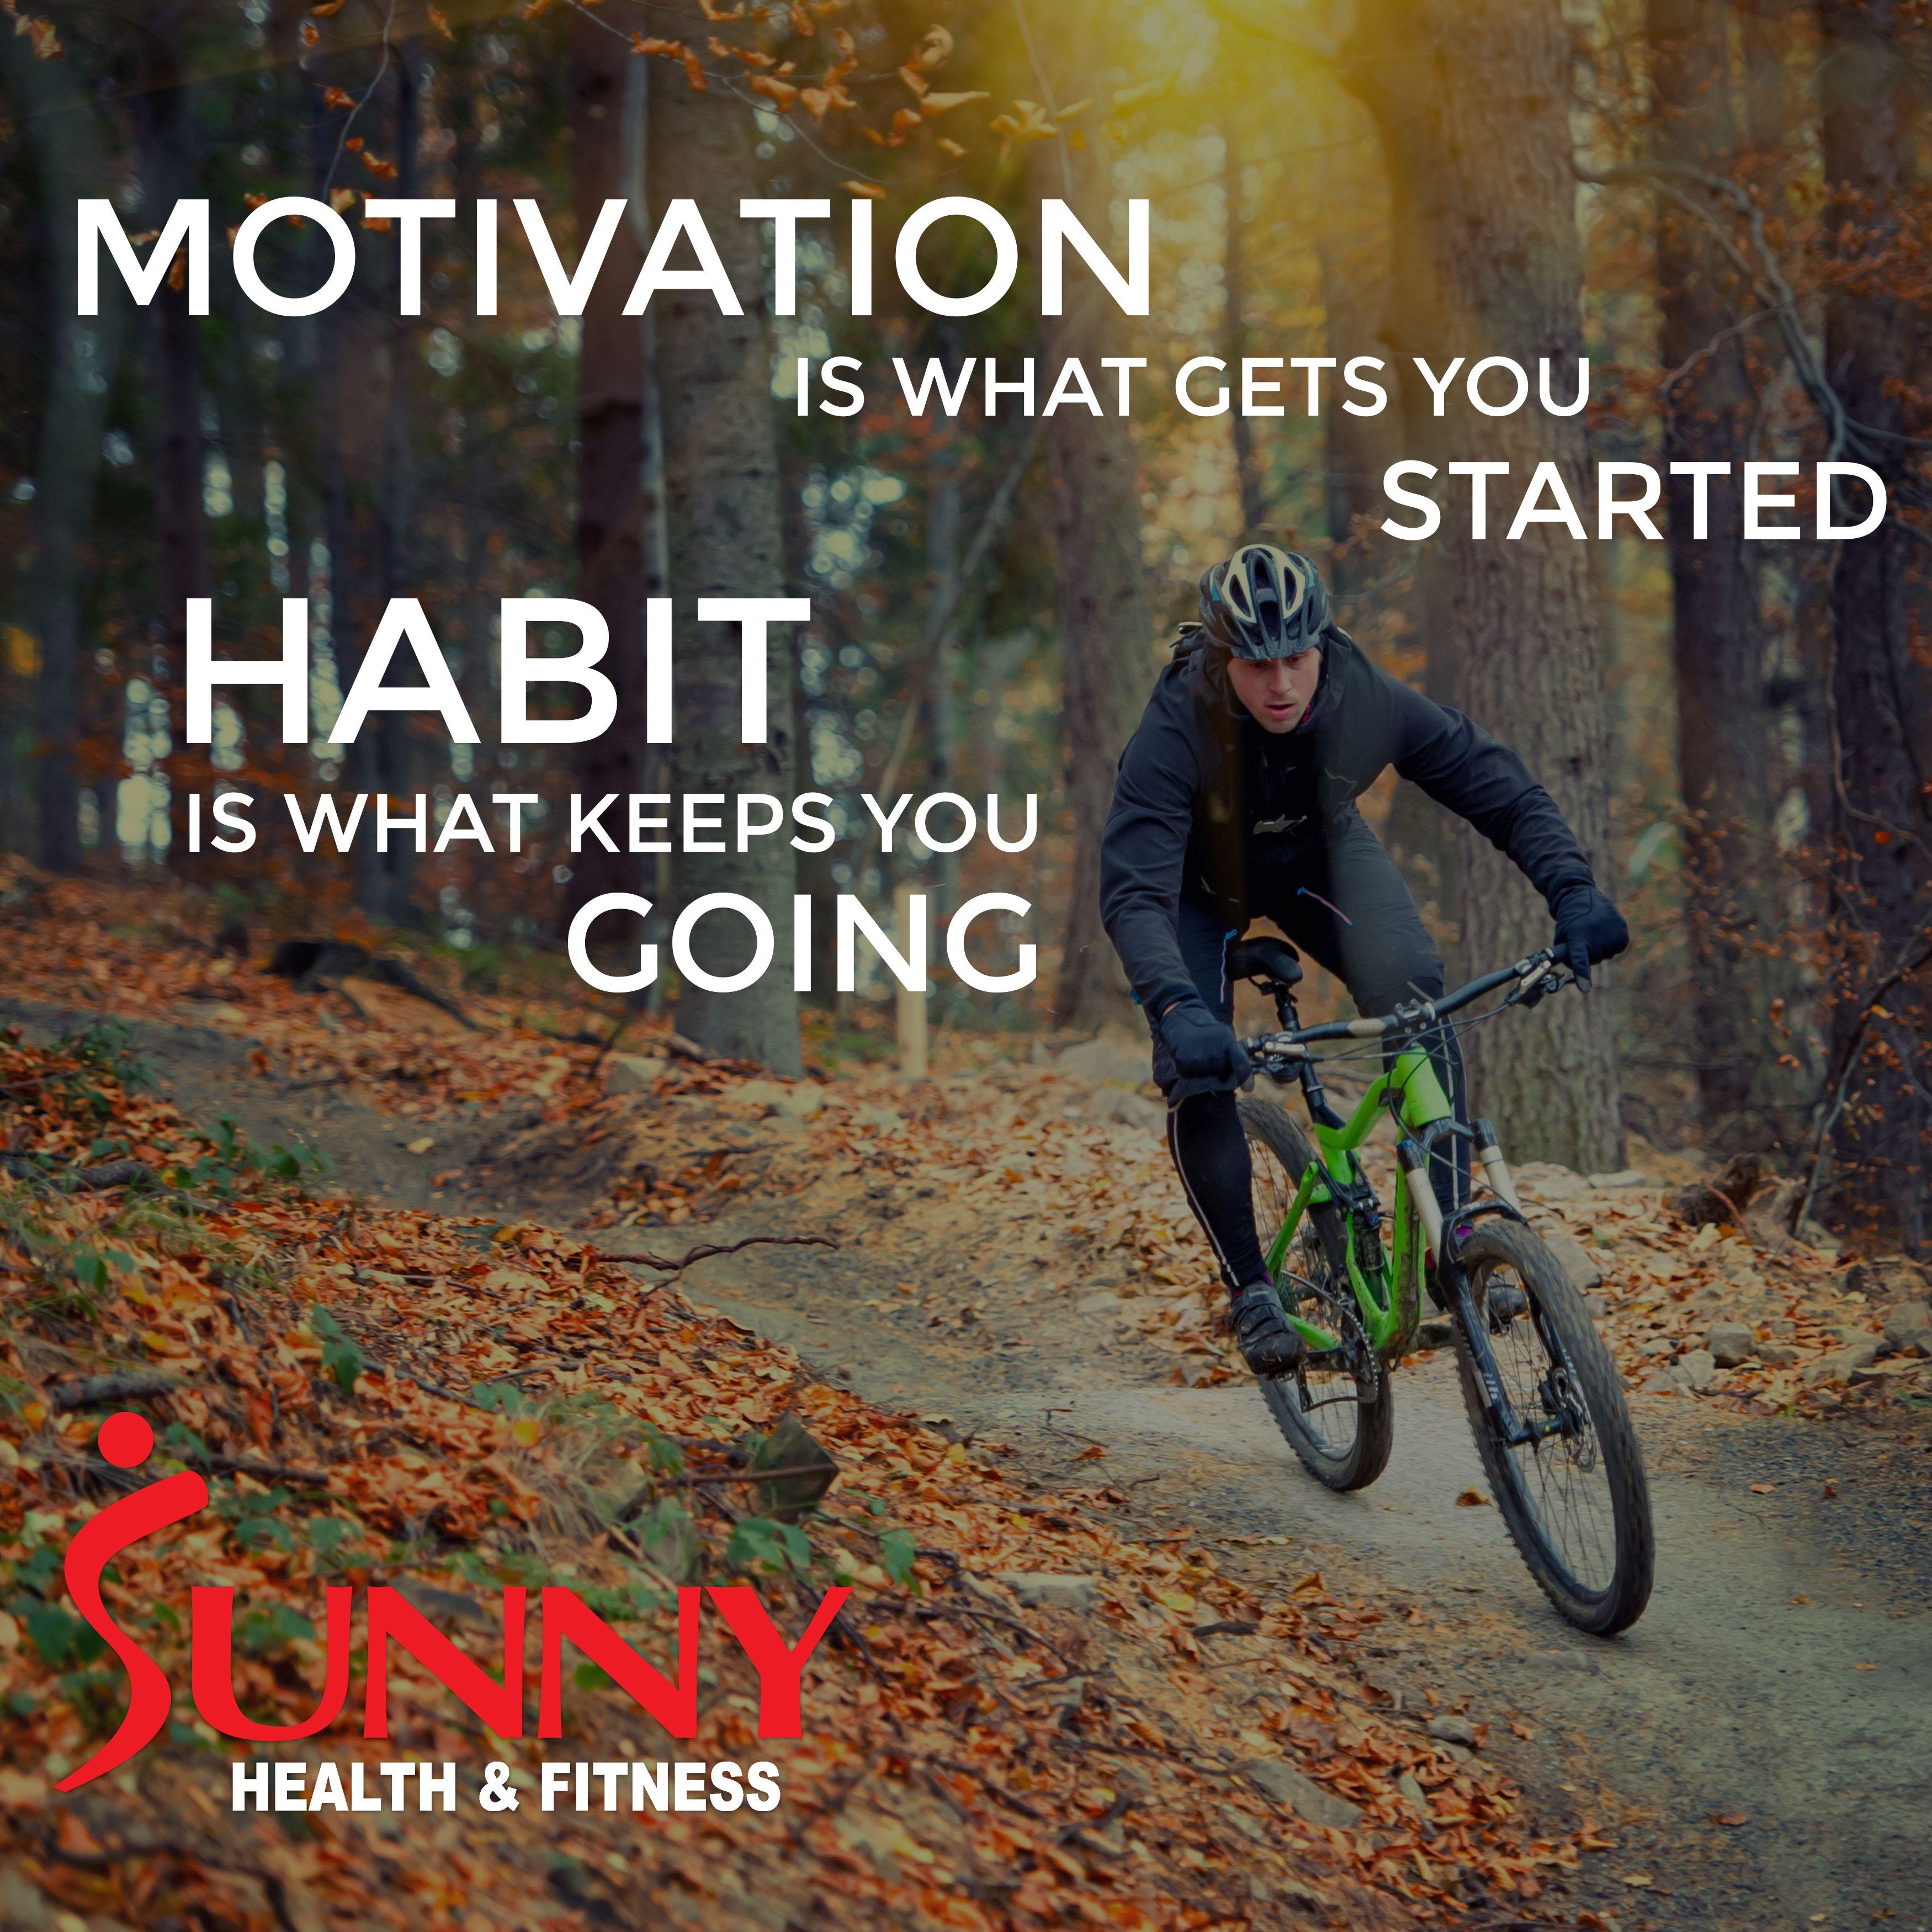 Motivation fitness habit fitness motivational inspiration